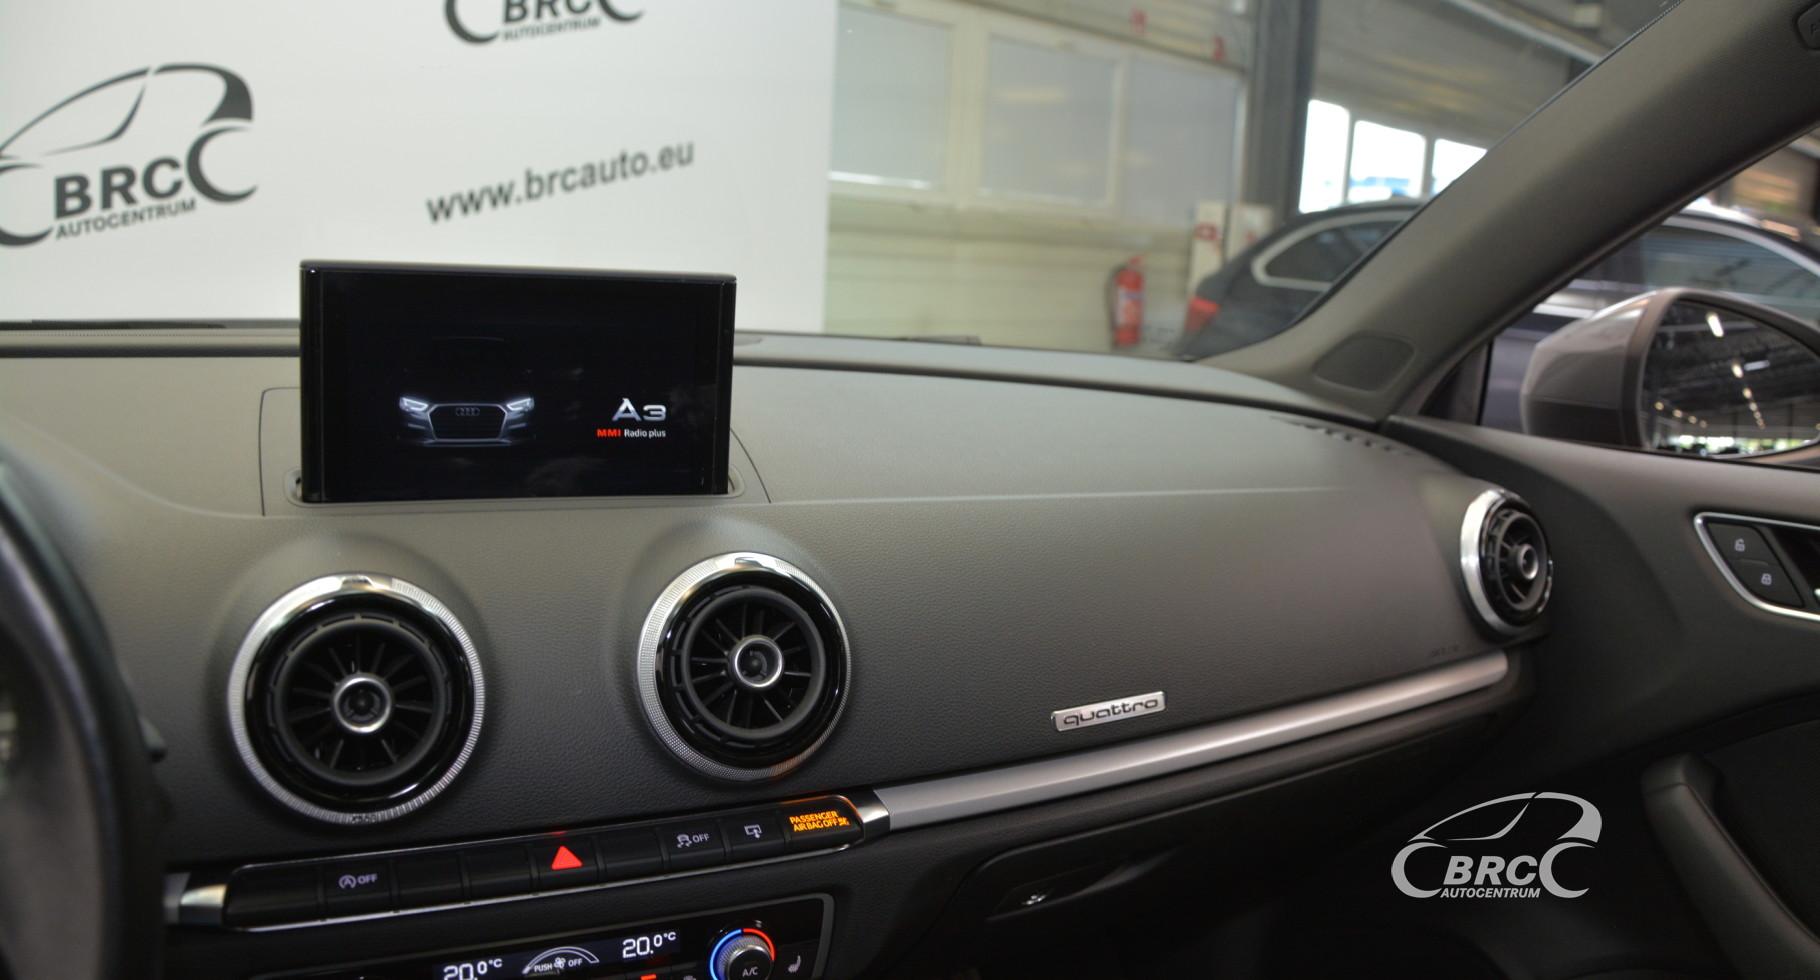 Audi A3 2.0 TFSI Quattro S-line Automatas